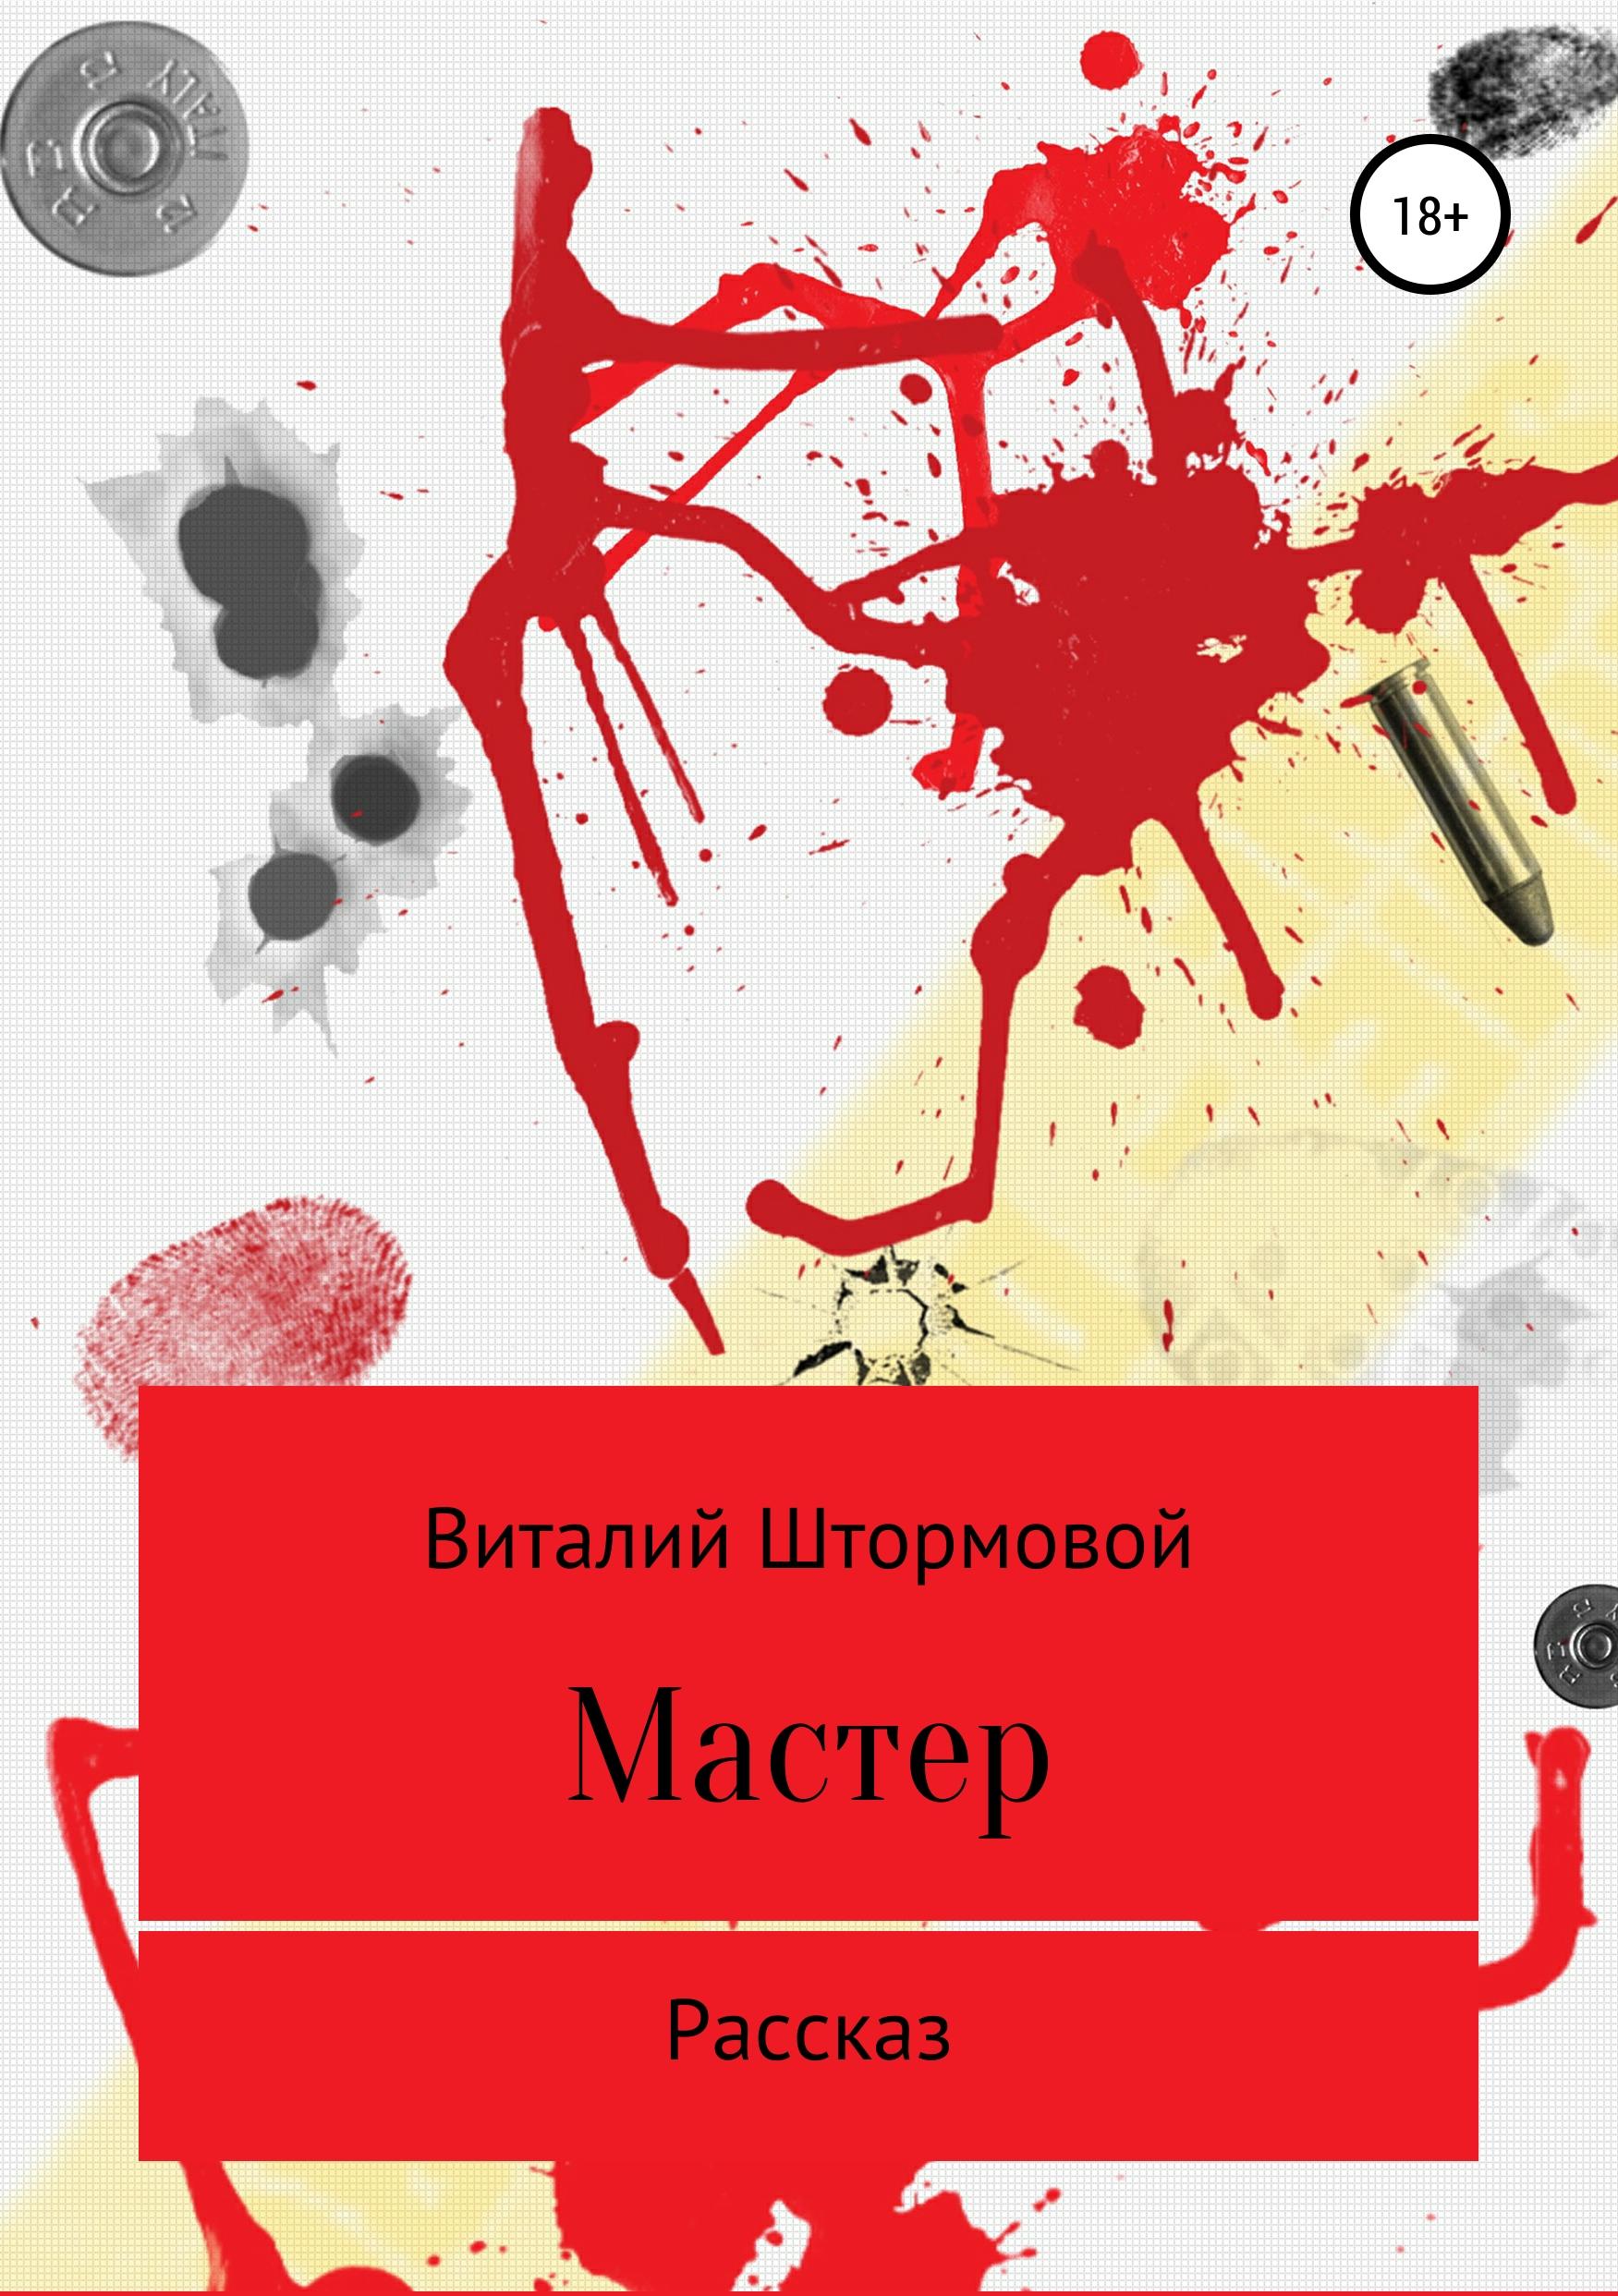 Виталий Штормовой Мастер цена и фото